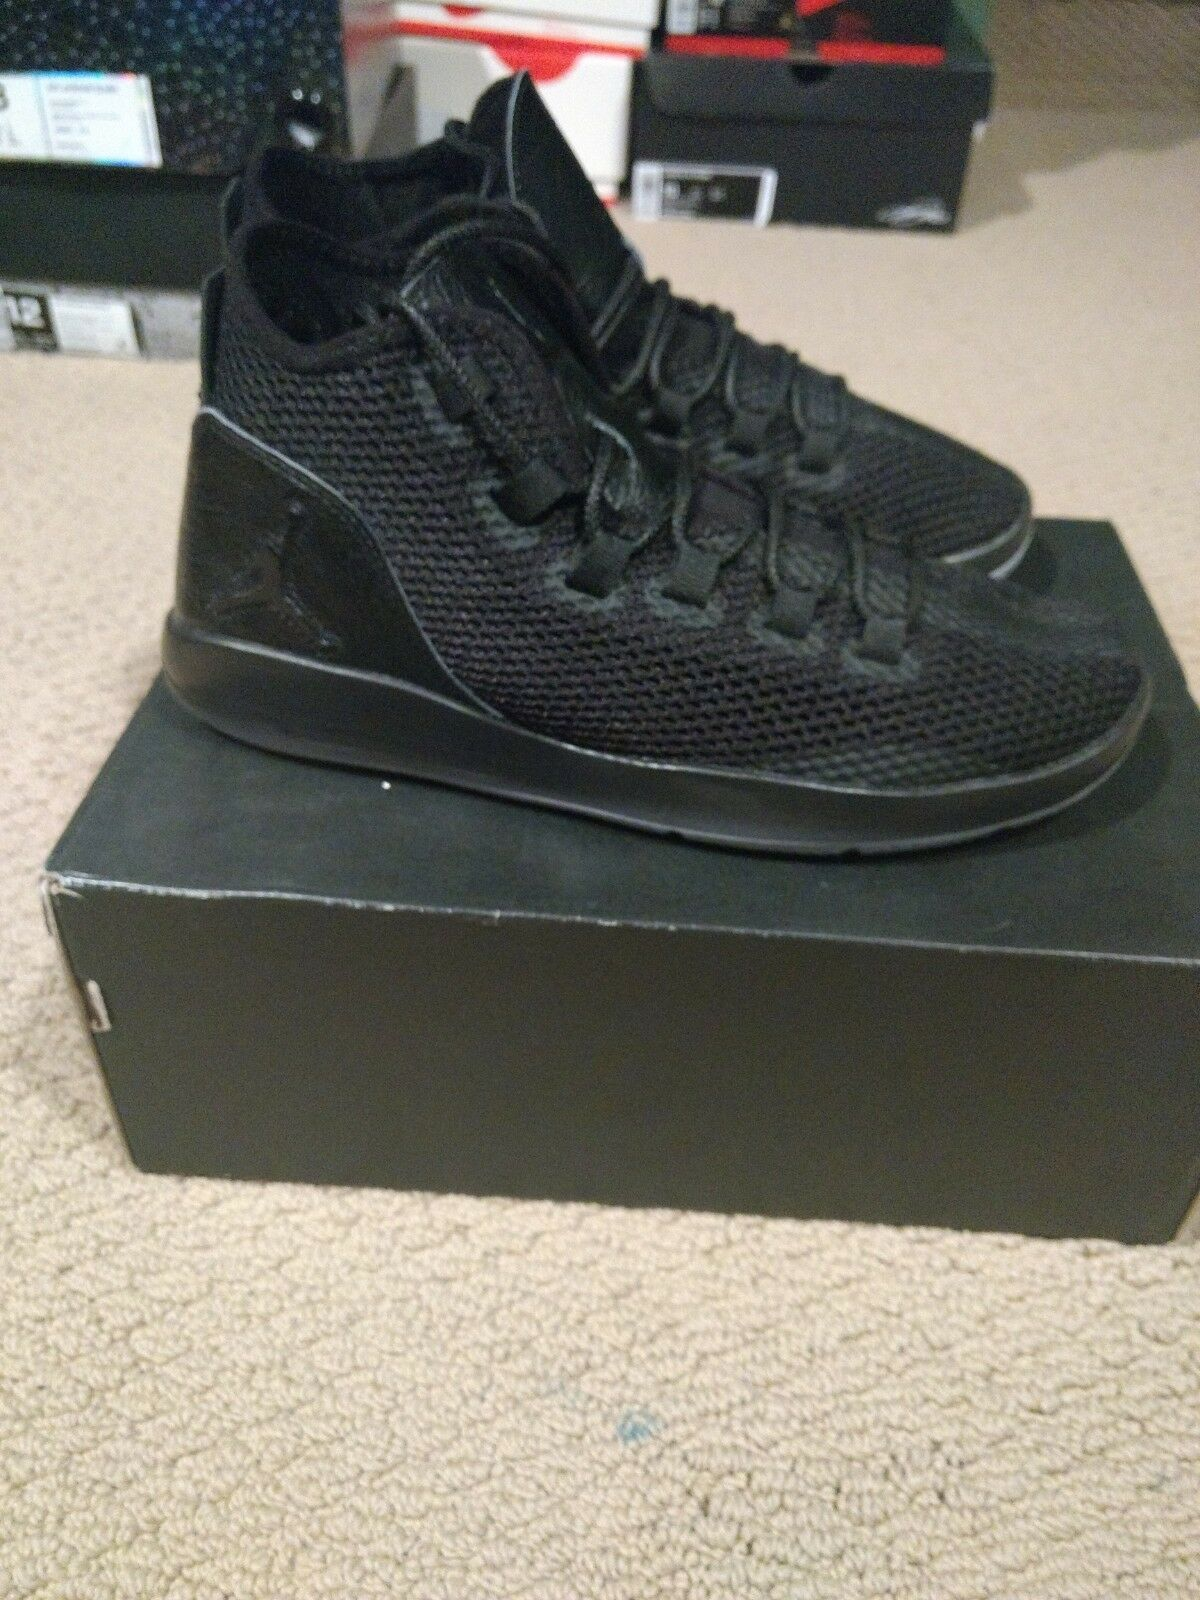 Jordan revelan Premium Negro Para Hombre Zapato Zapatilla 834229-010 Prem